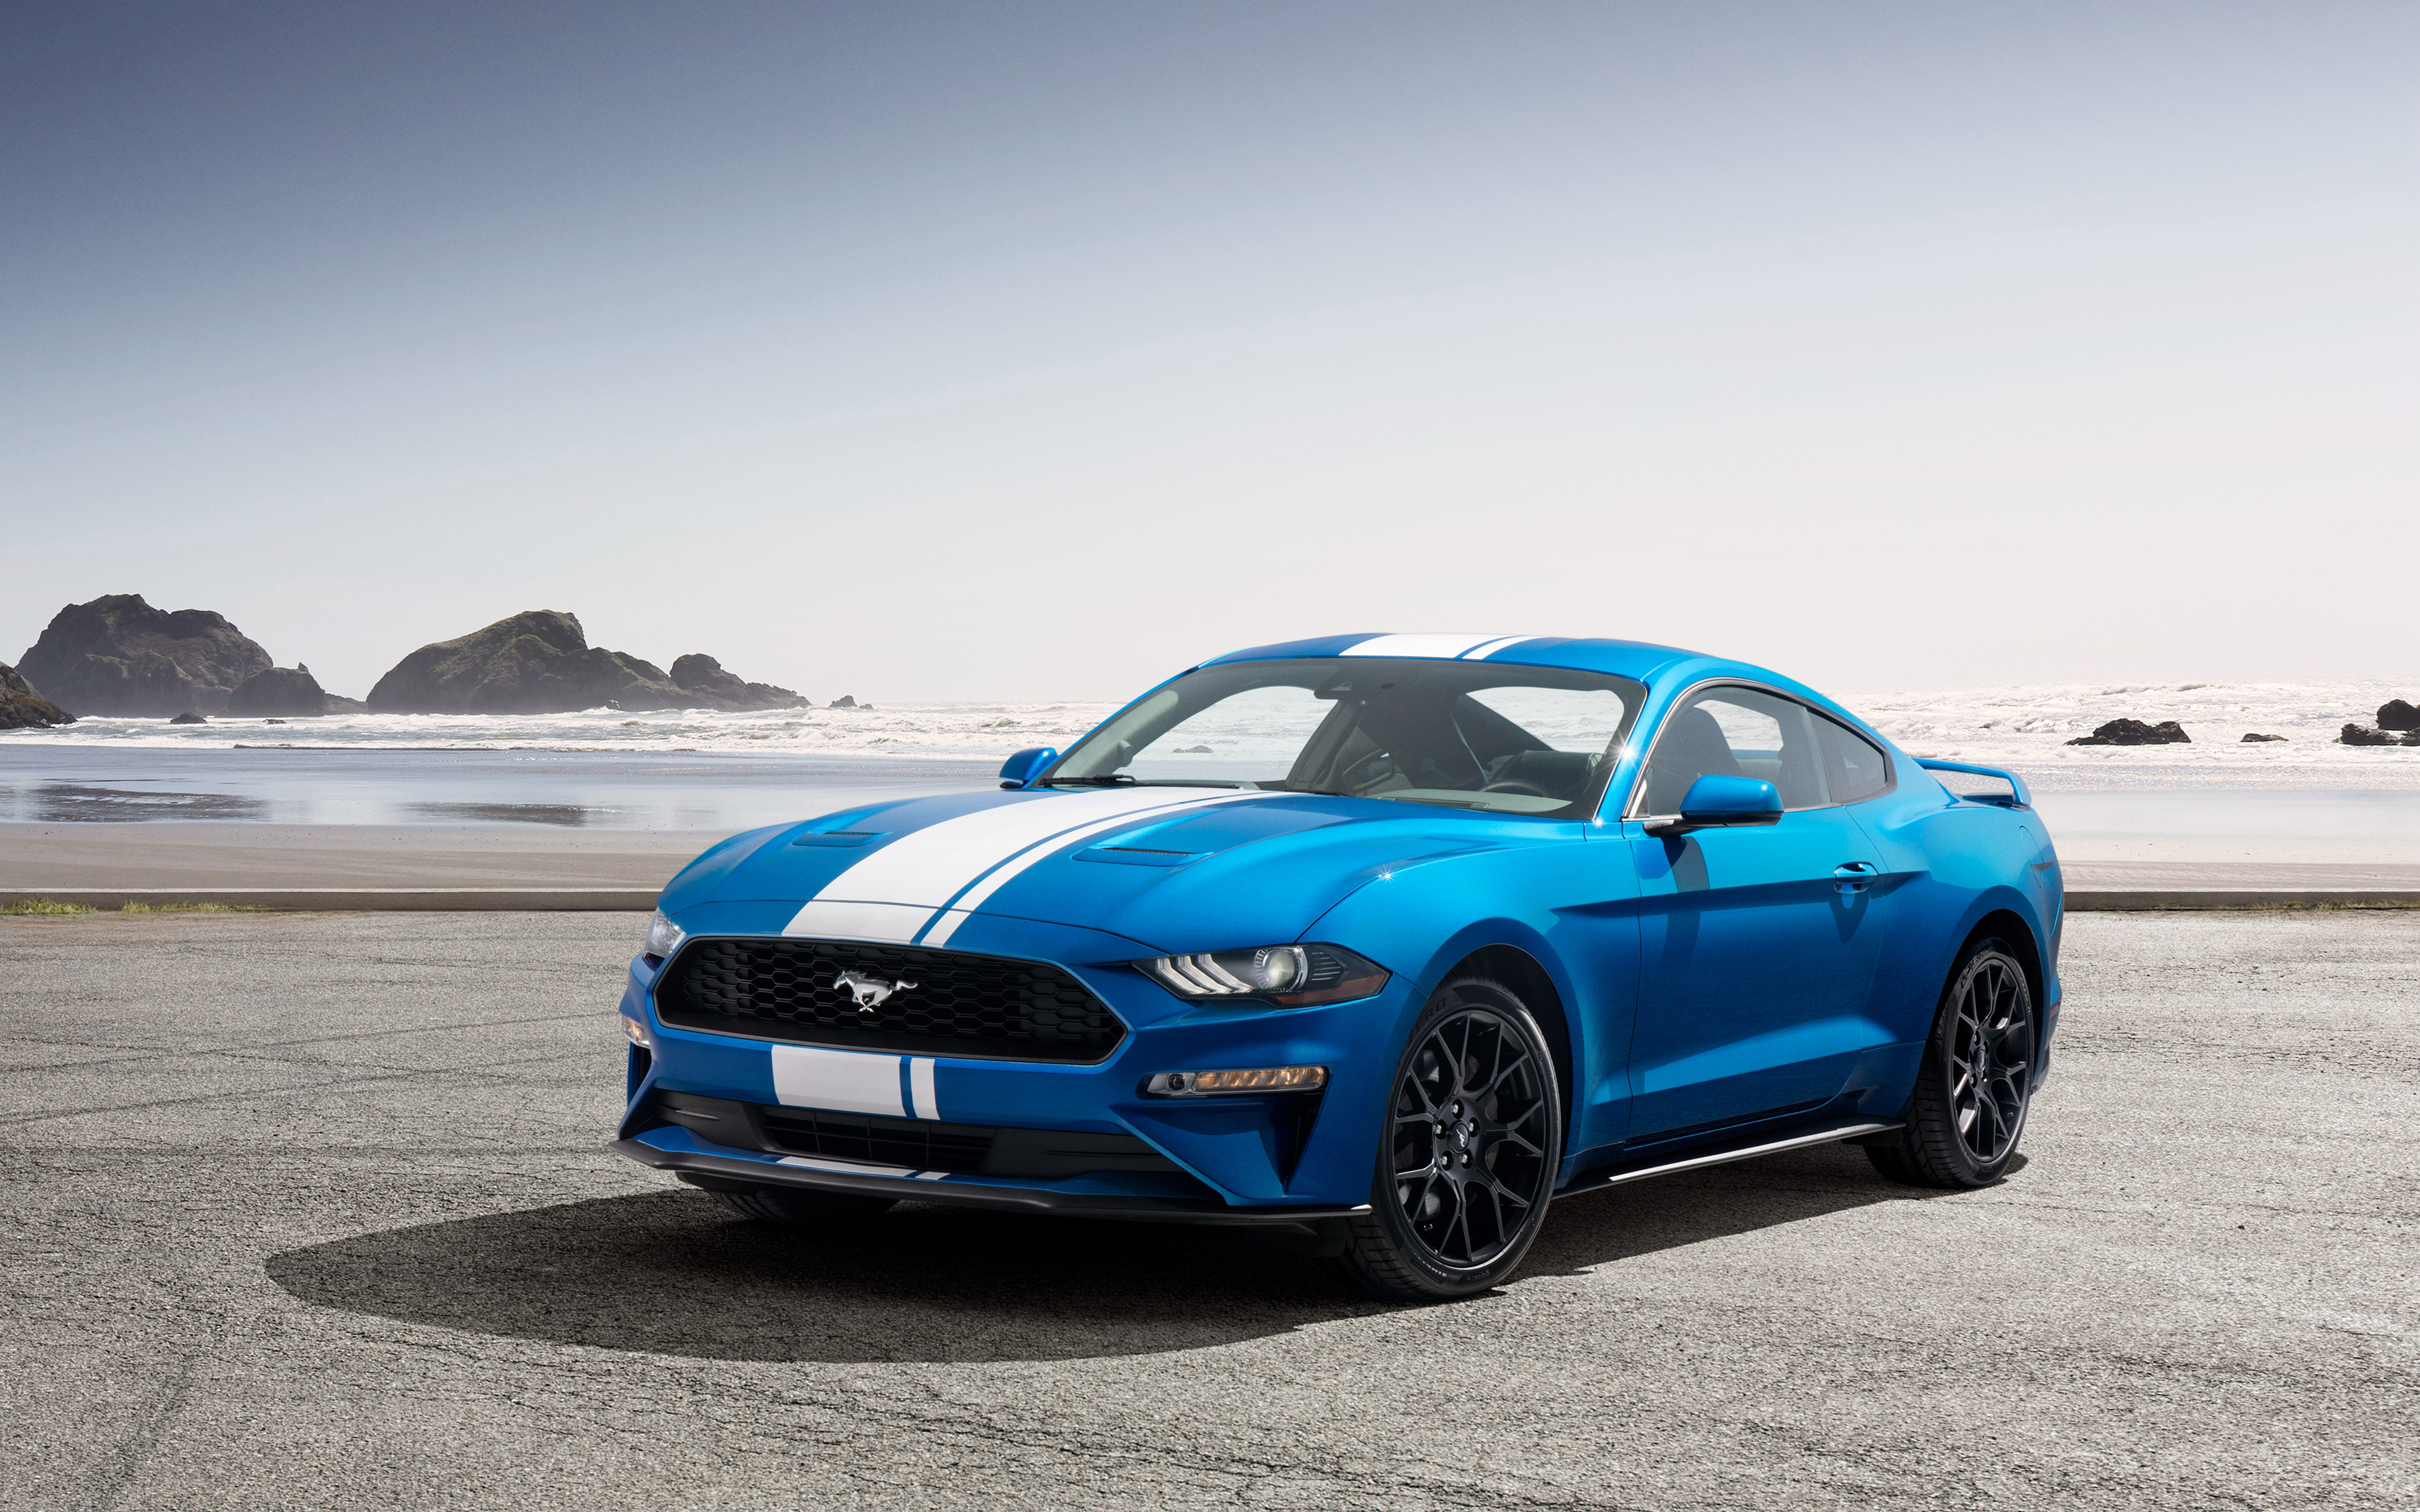 2019 Ford Mustang Ecoboost Performance Pack 4k 2019 Mustang Ecoboost Performance Package 3840x2400 Download Hd Wallpaper Wallpapertip